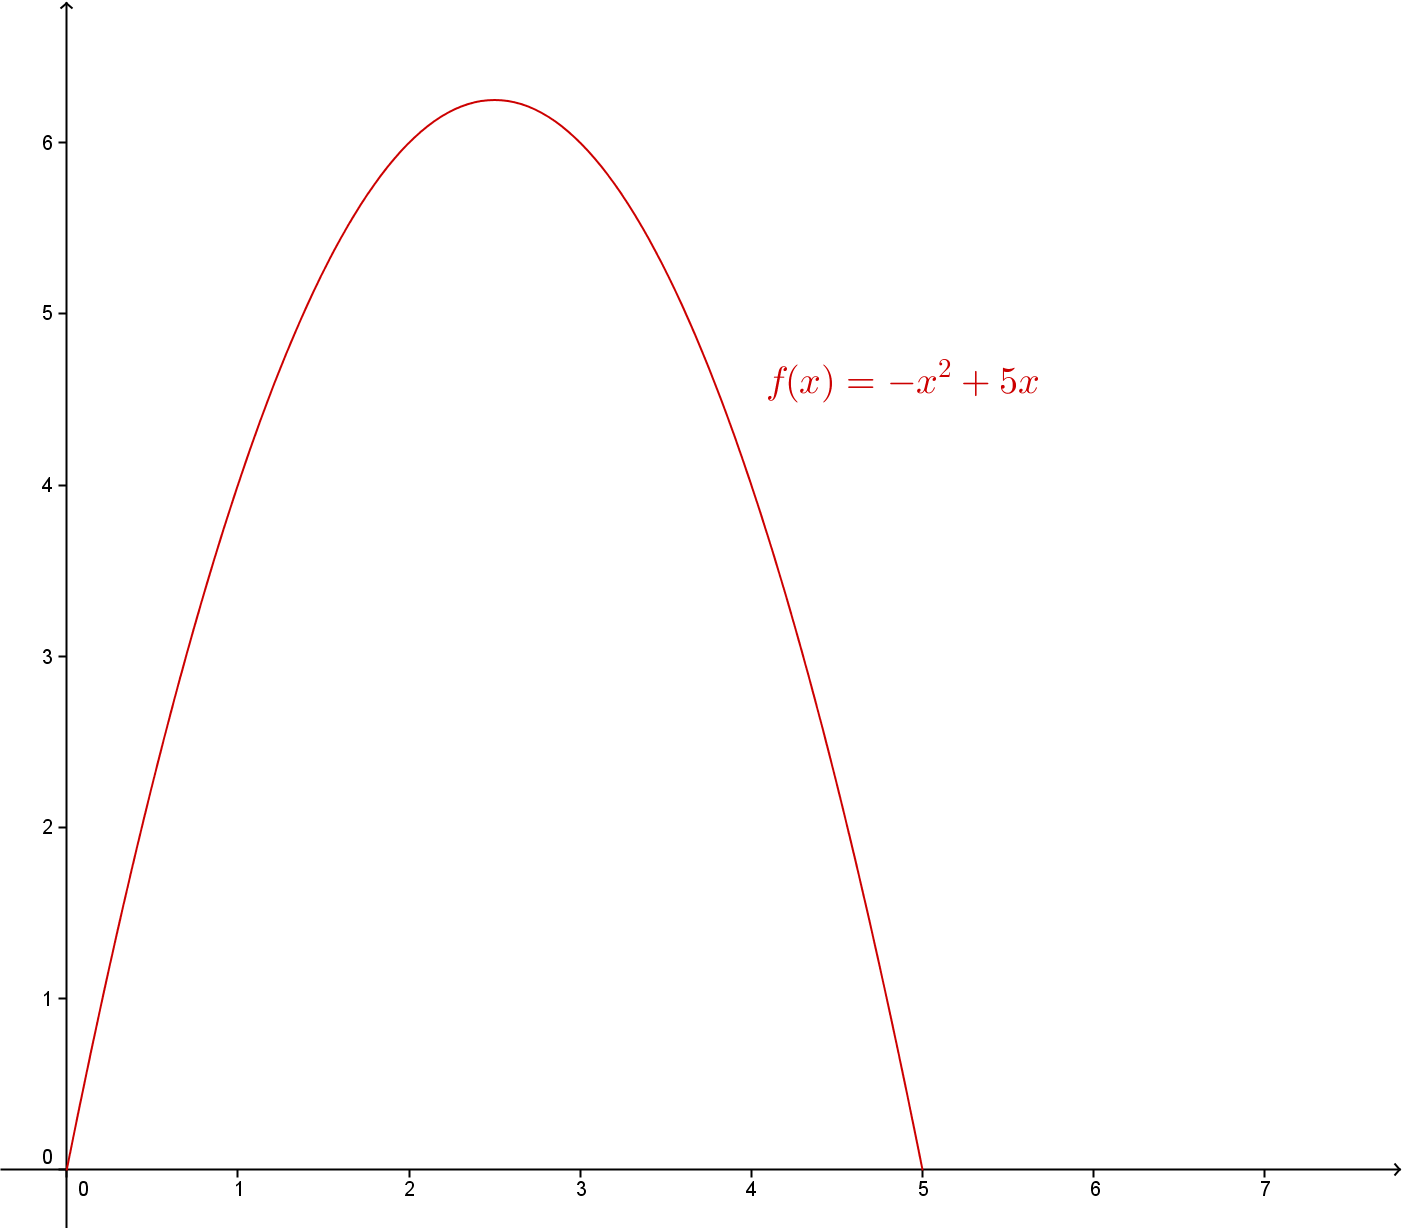 Grafen til f(x) = -5x^2 + 5x